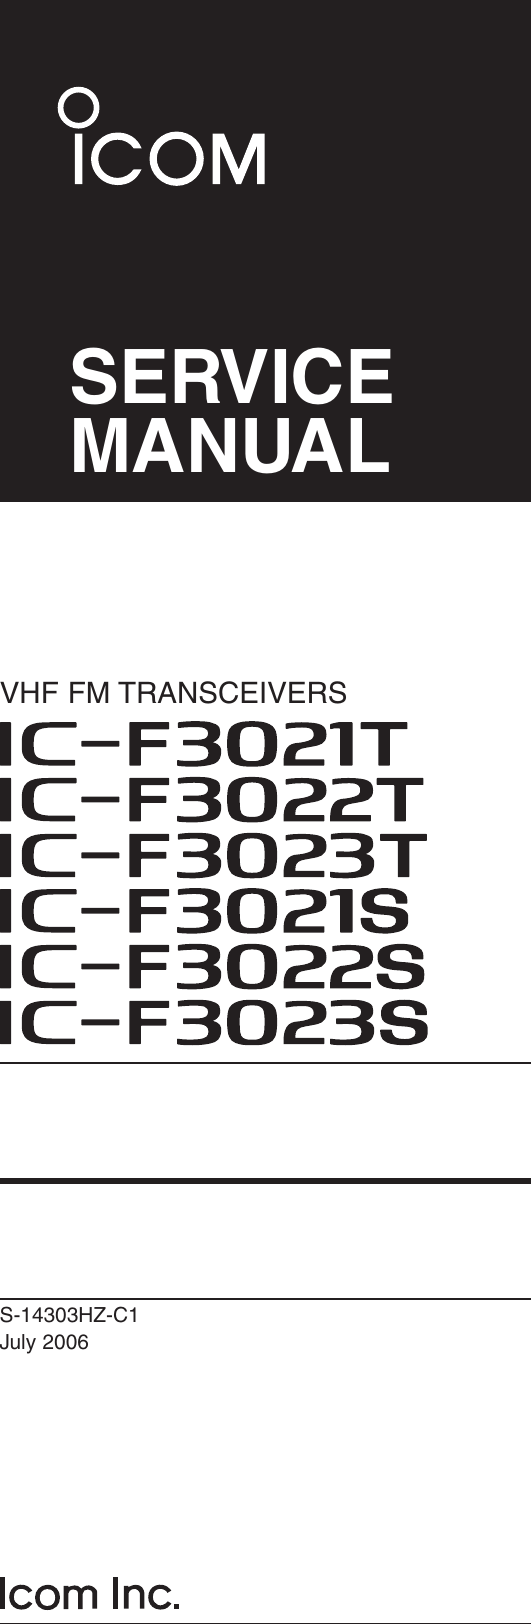 Icom Ic F3021S Users Manual F3020 Series SERVICE